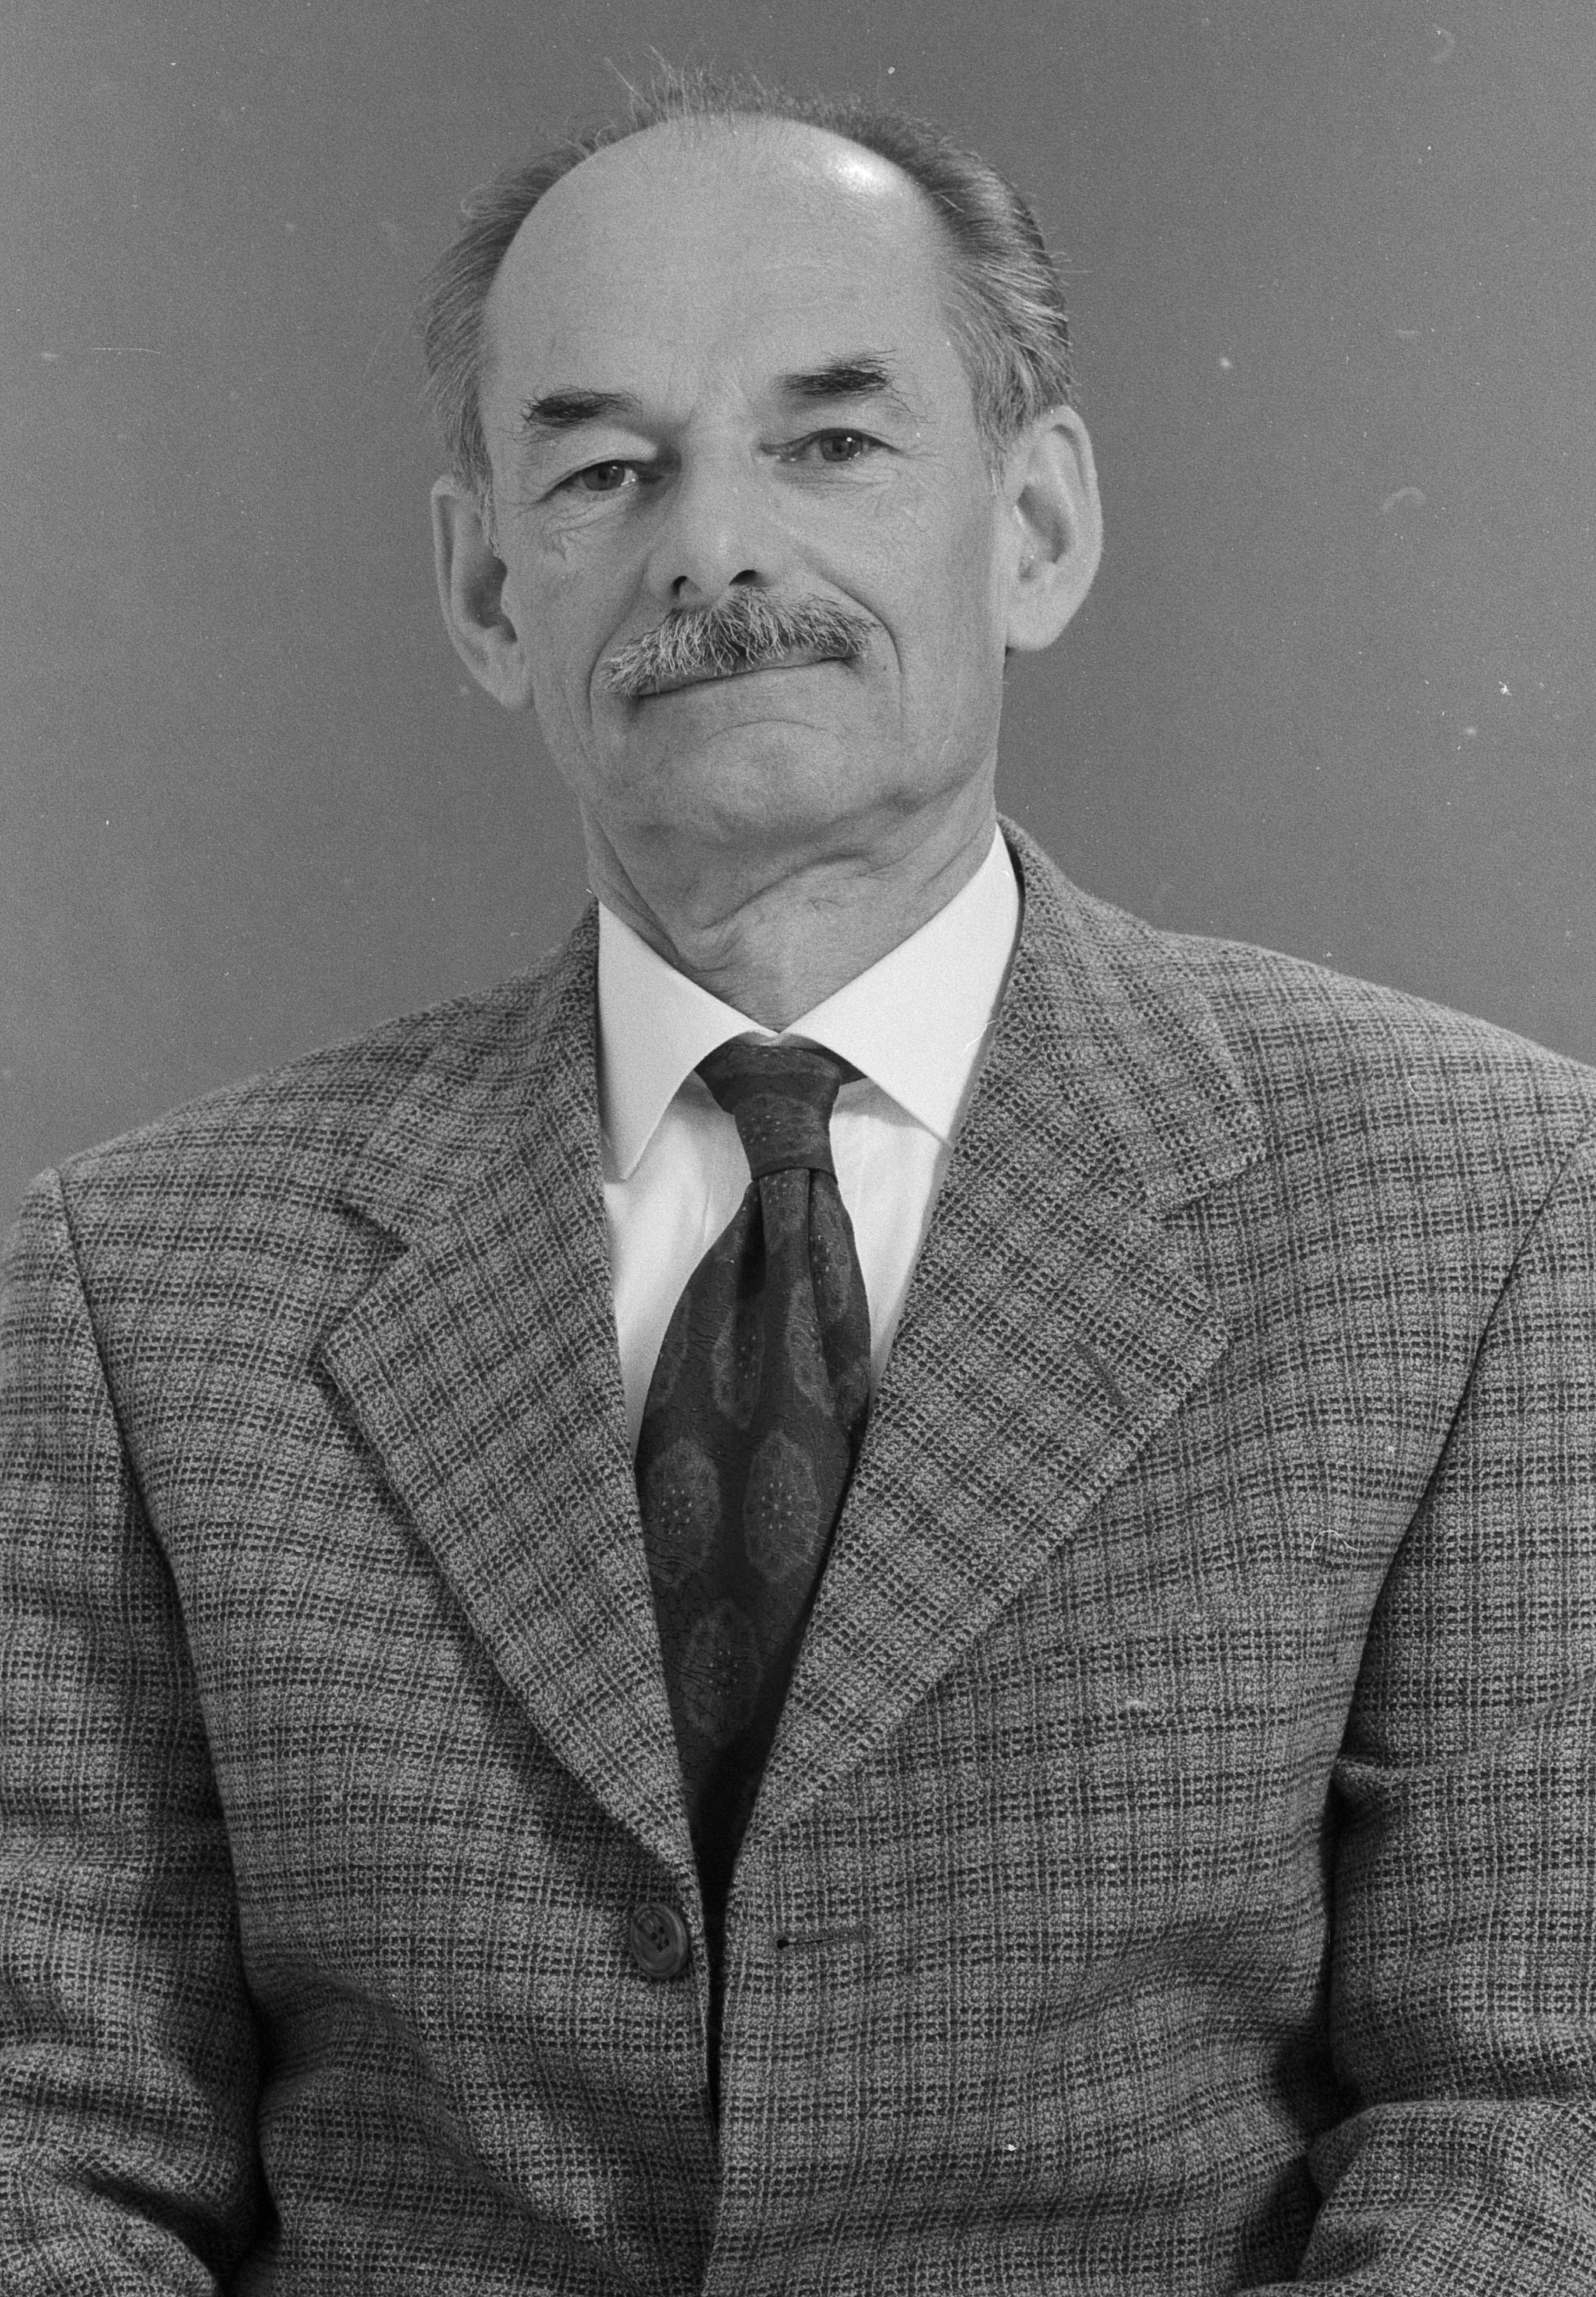 Donald Rogers, 1935-2019